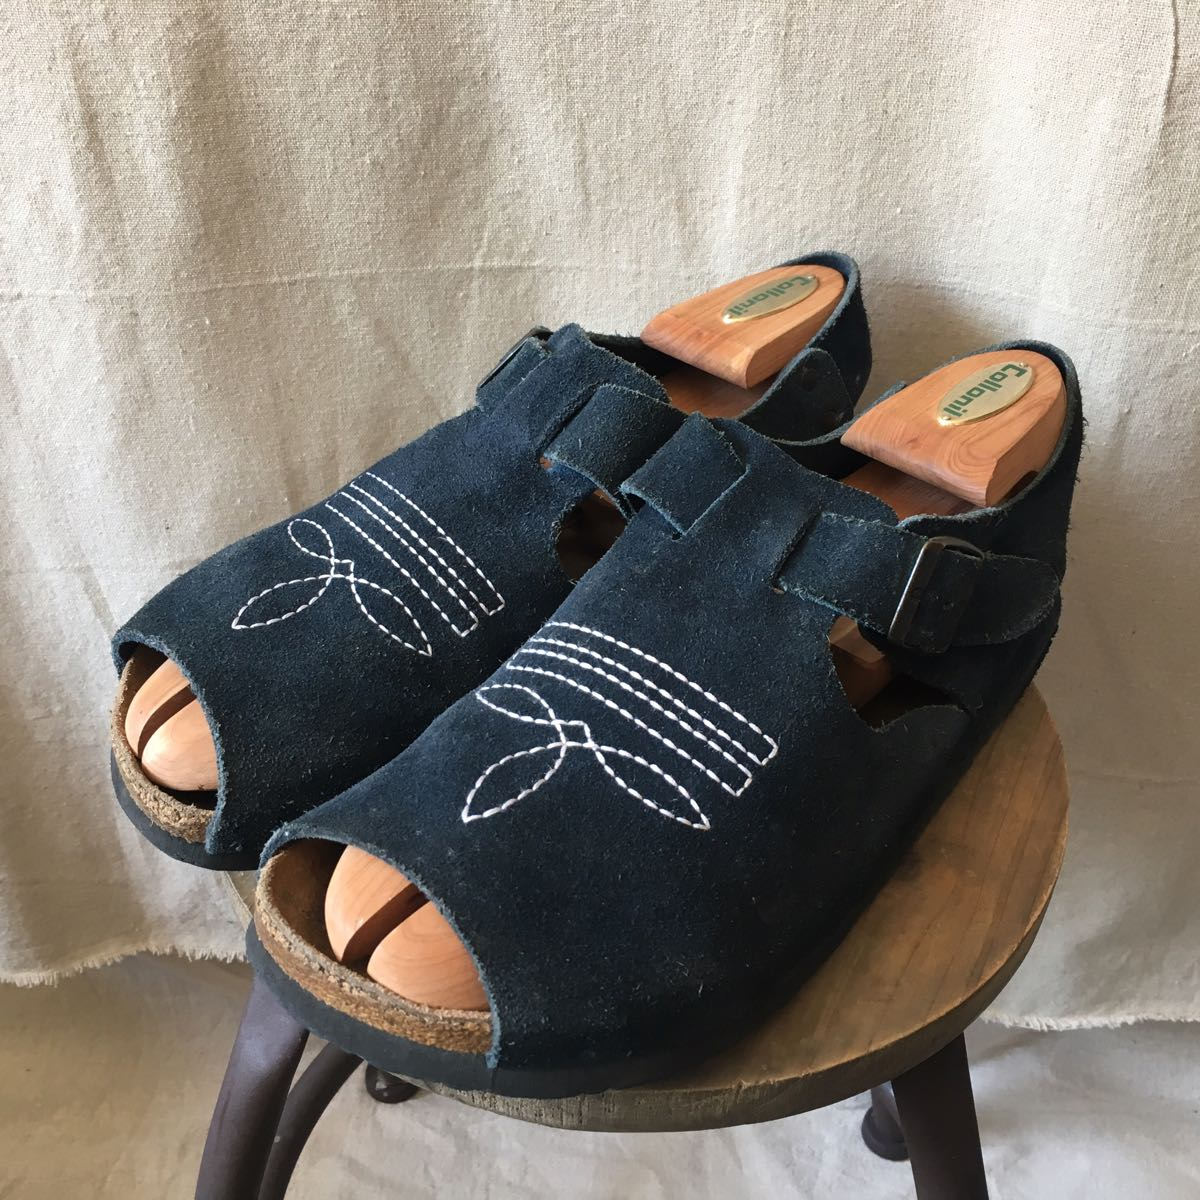 new design great quality best shoes 中古】BIRKENSTOCK papillio vienna / 27cm サンダル ロンドン ...